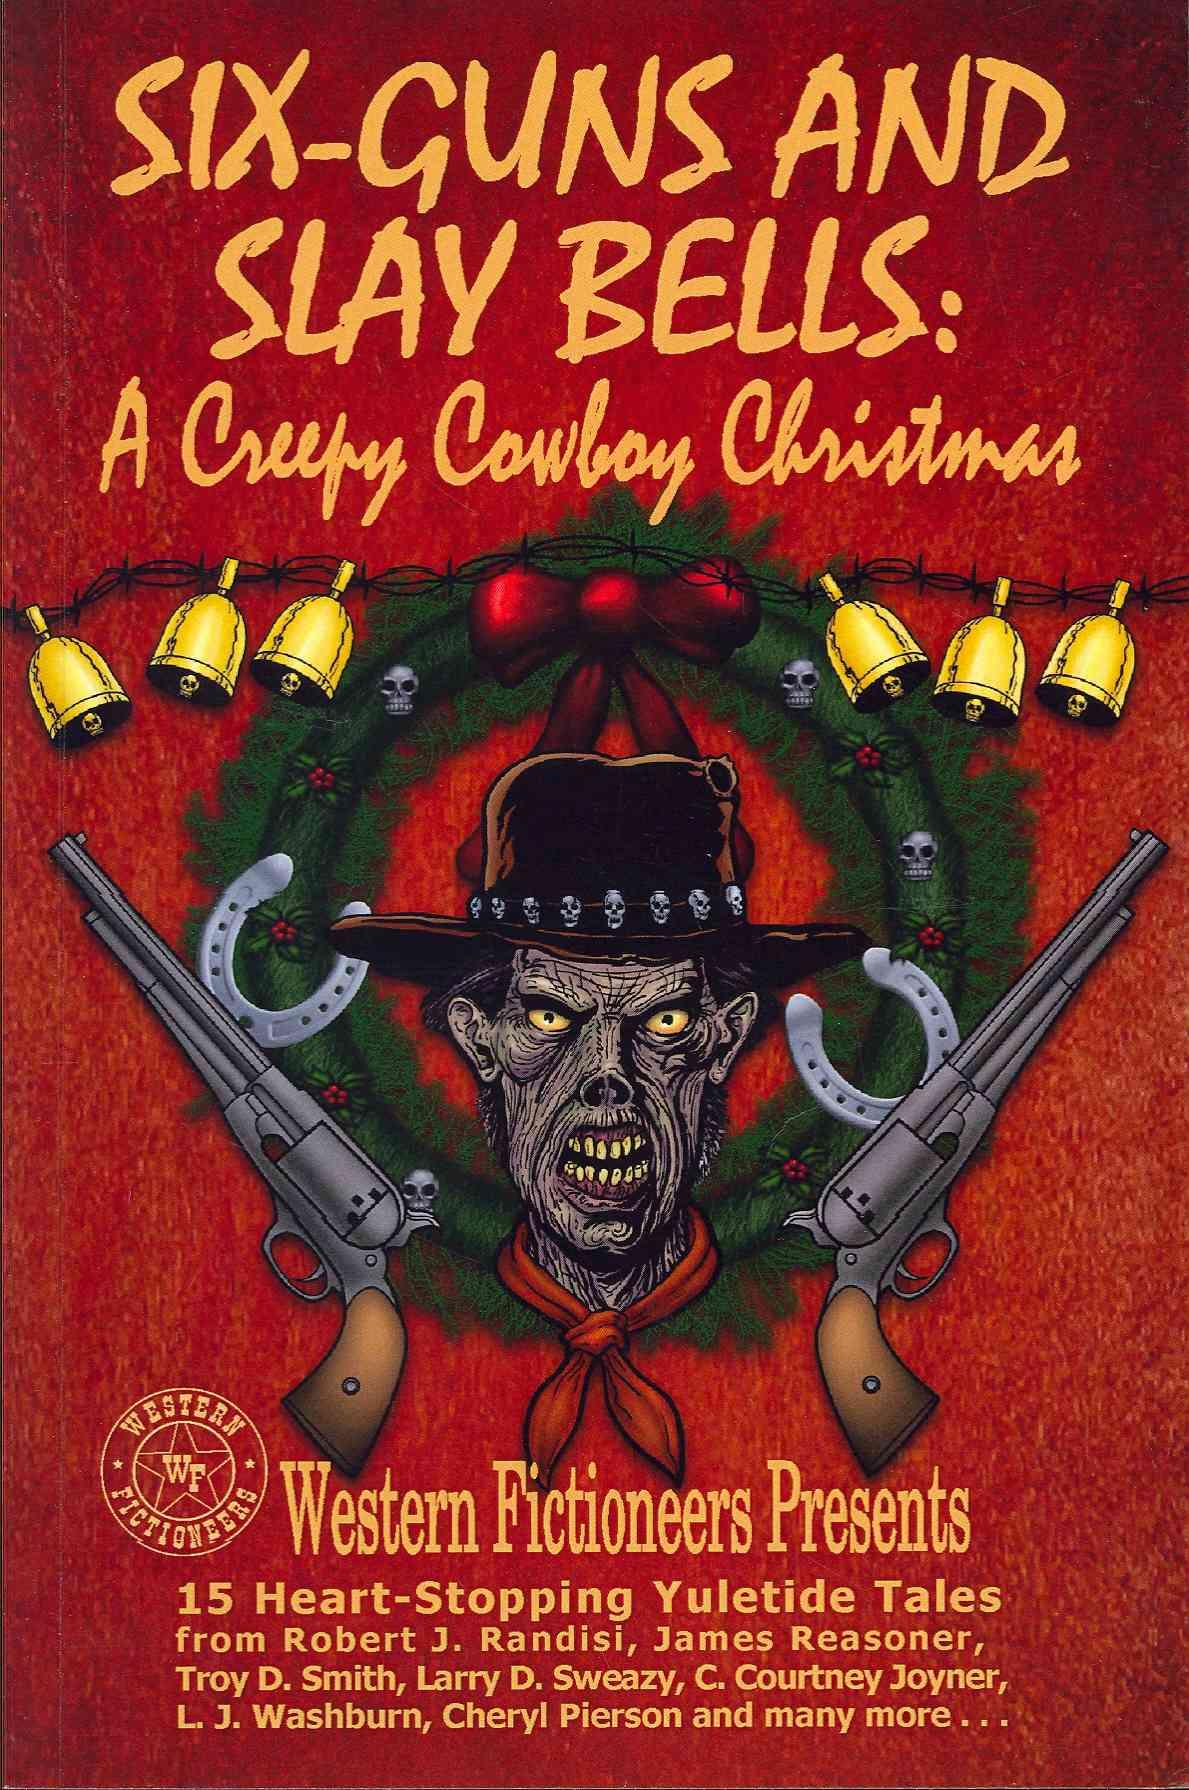 Six-Guns and Slay Bells: A Creepy Cowboy Christmas (Paperback)